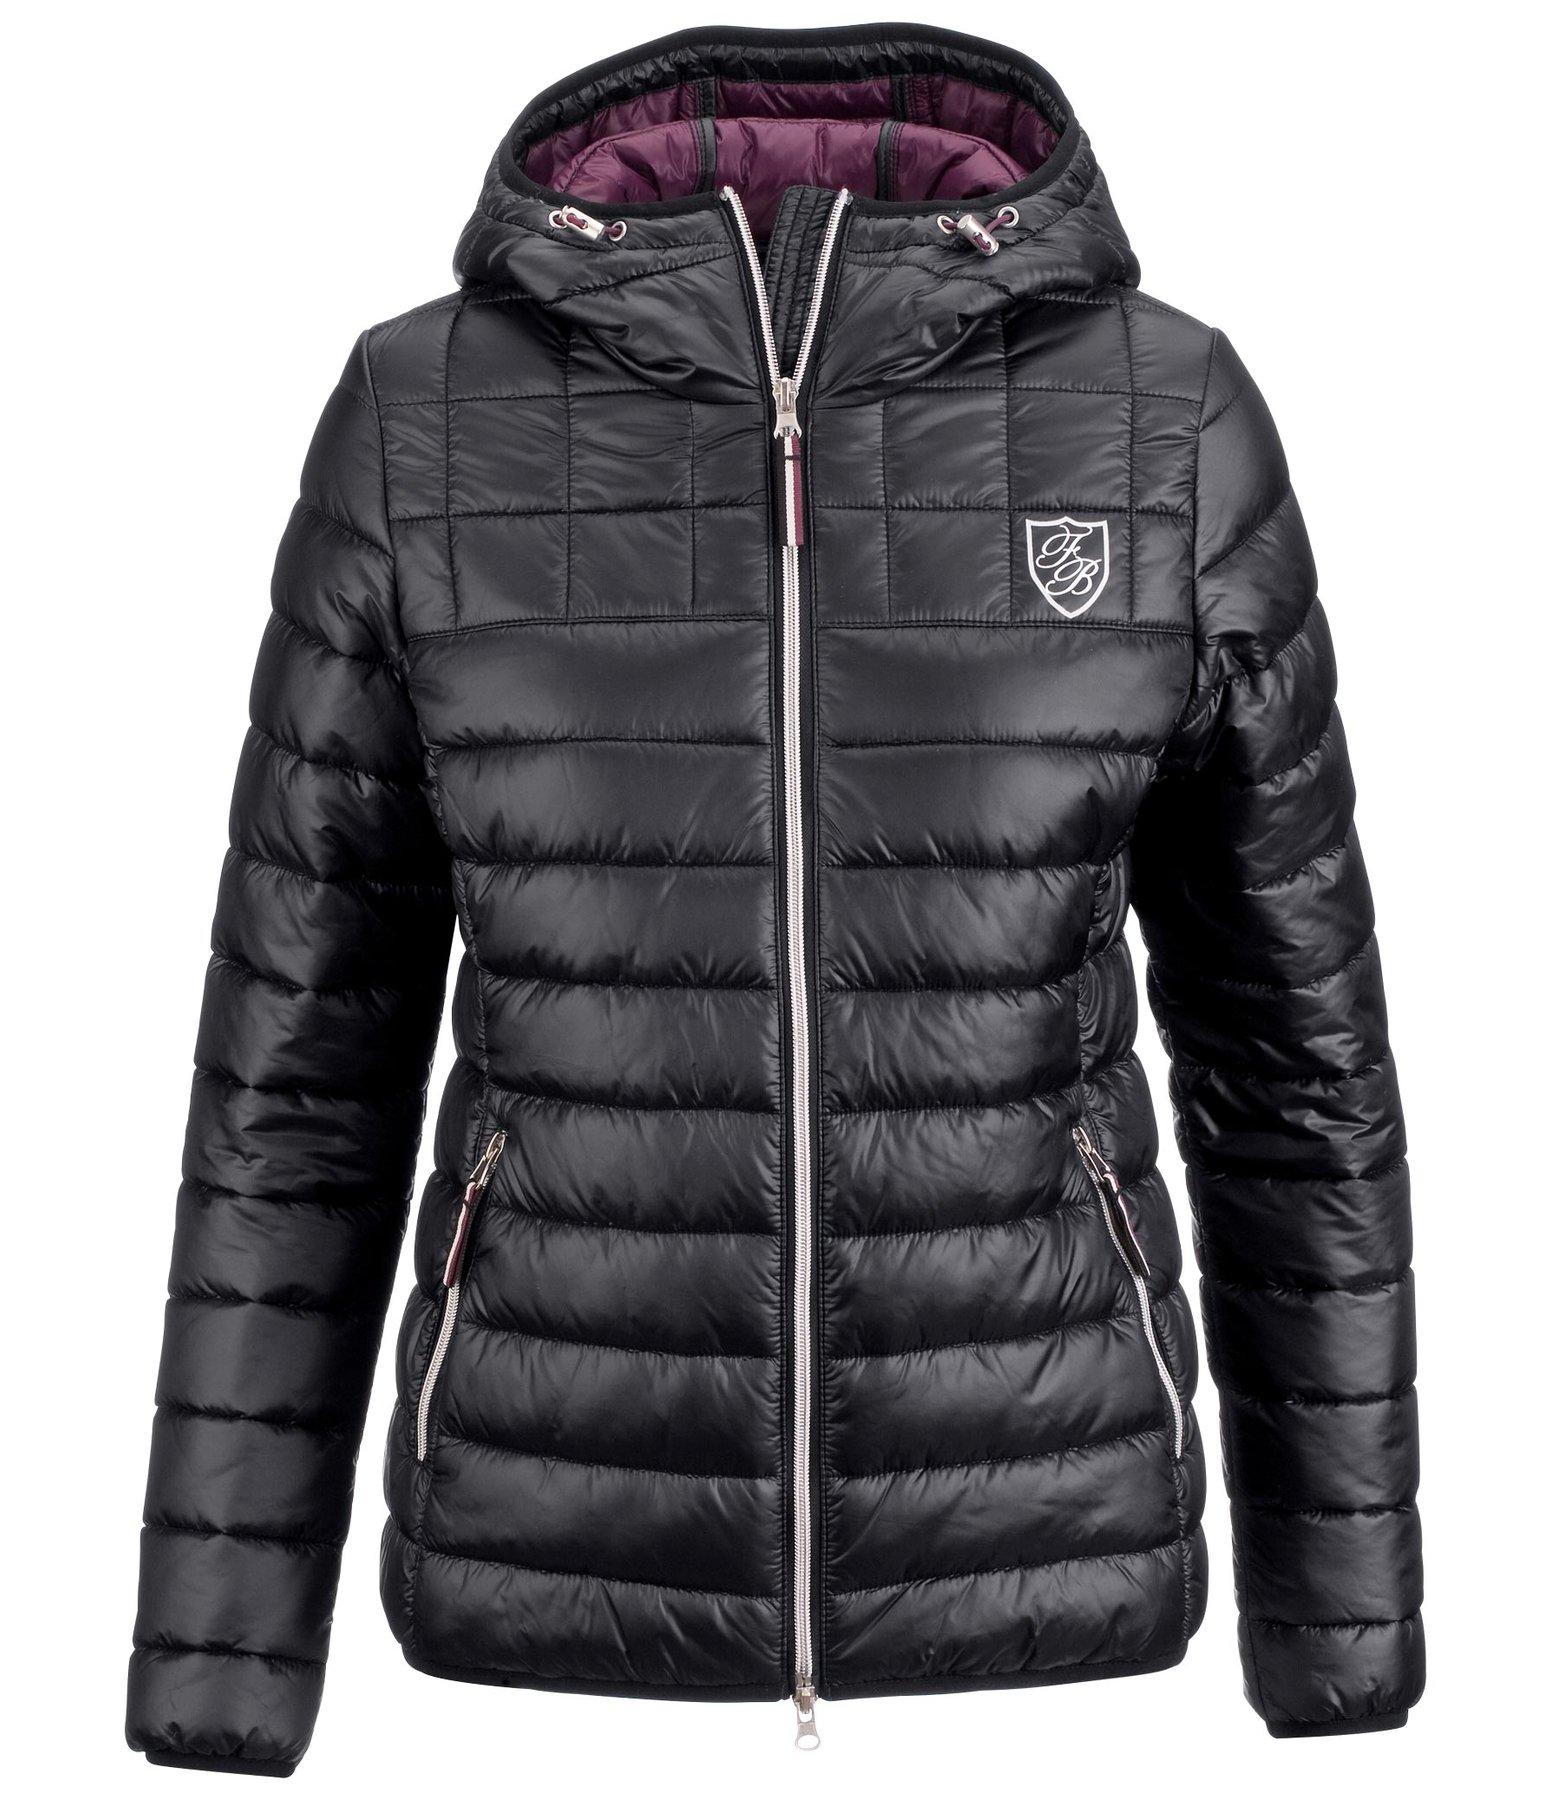 s attire quilted country penton designer men jacket jackets indigo mens quilt barbour